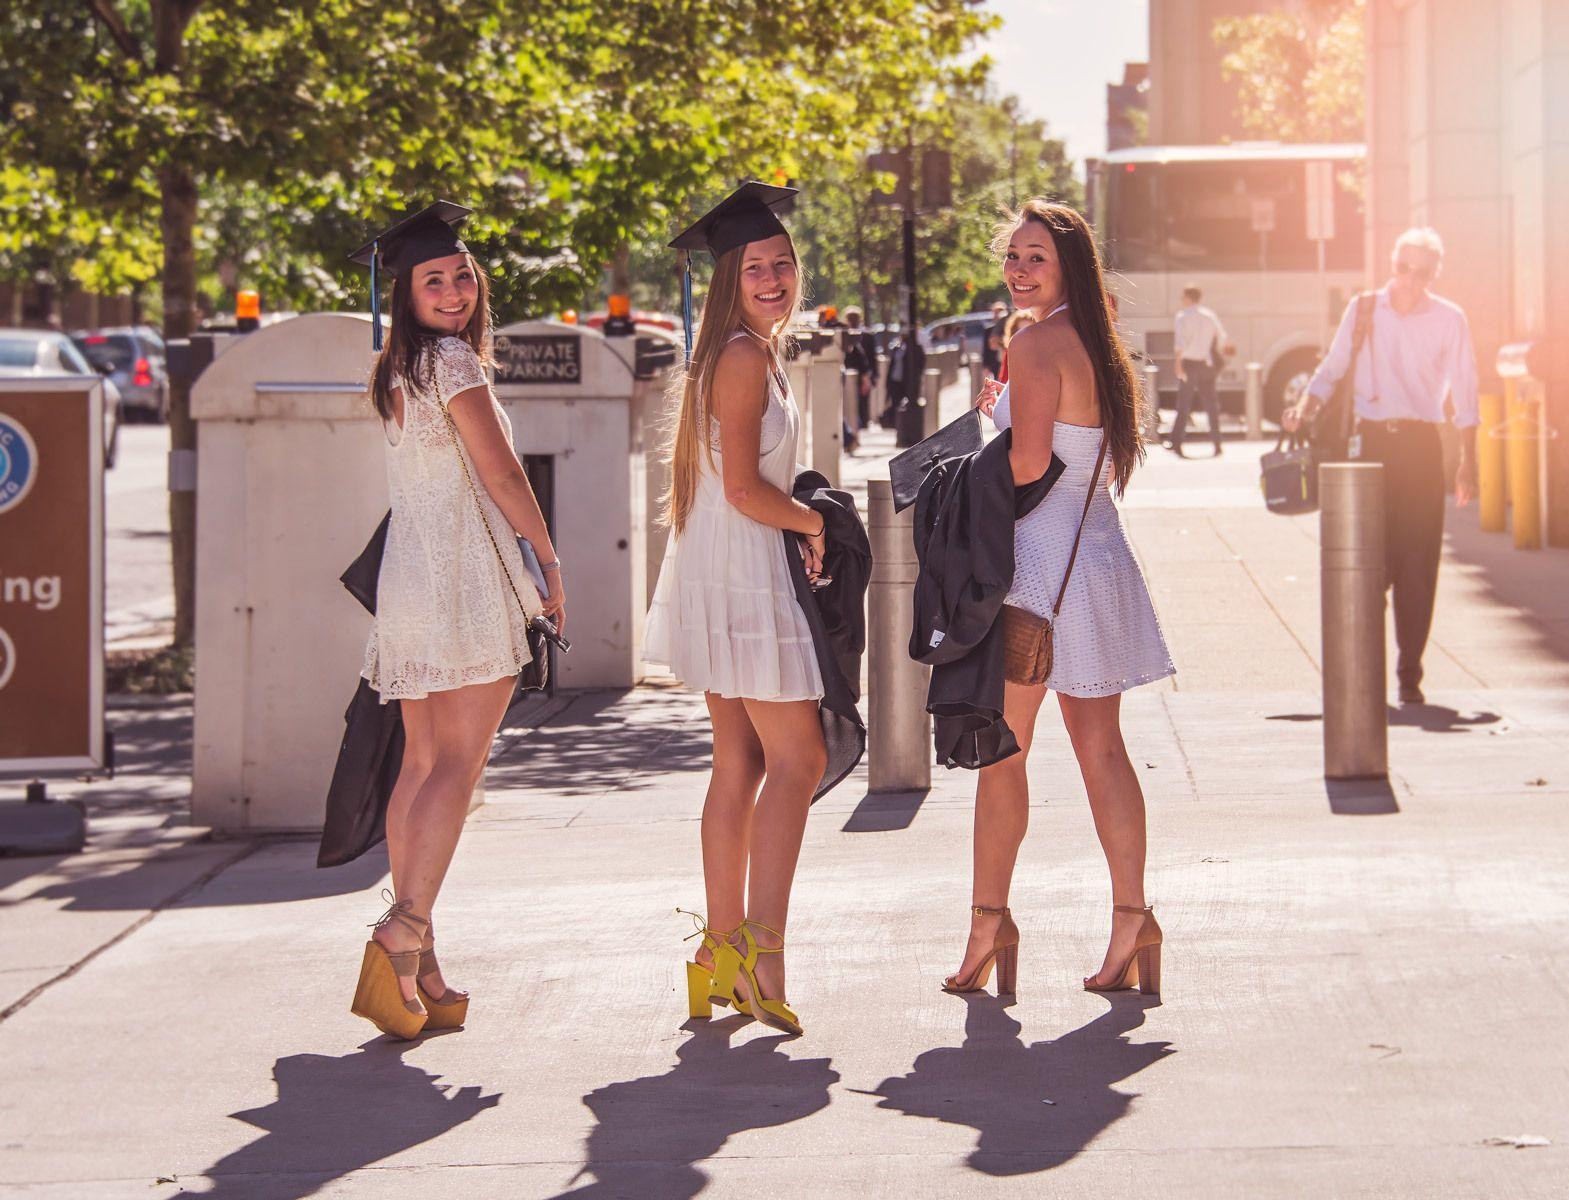 Graduation Day - three teenage girls graduating